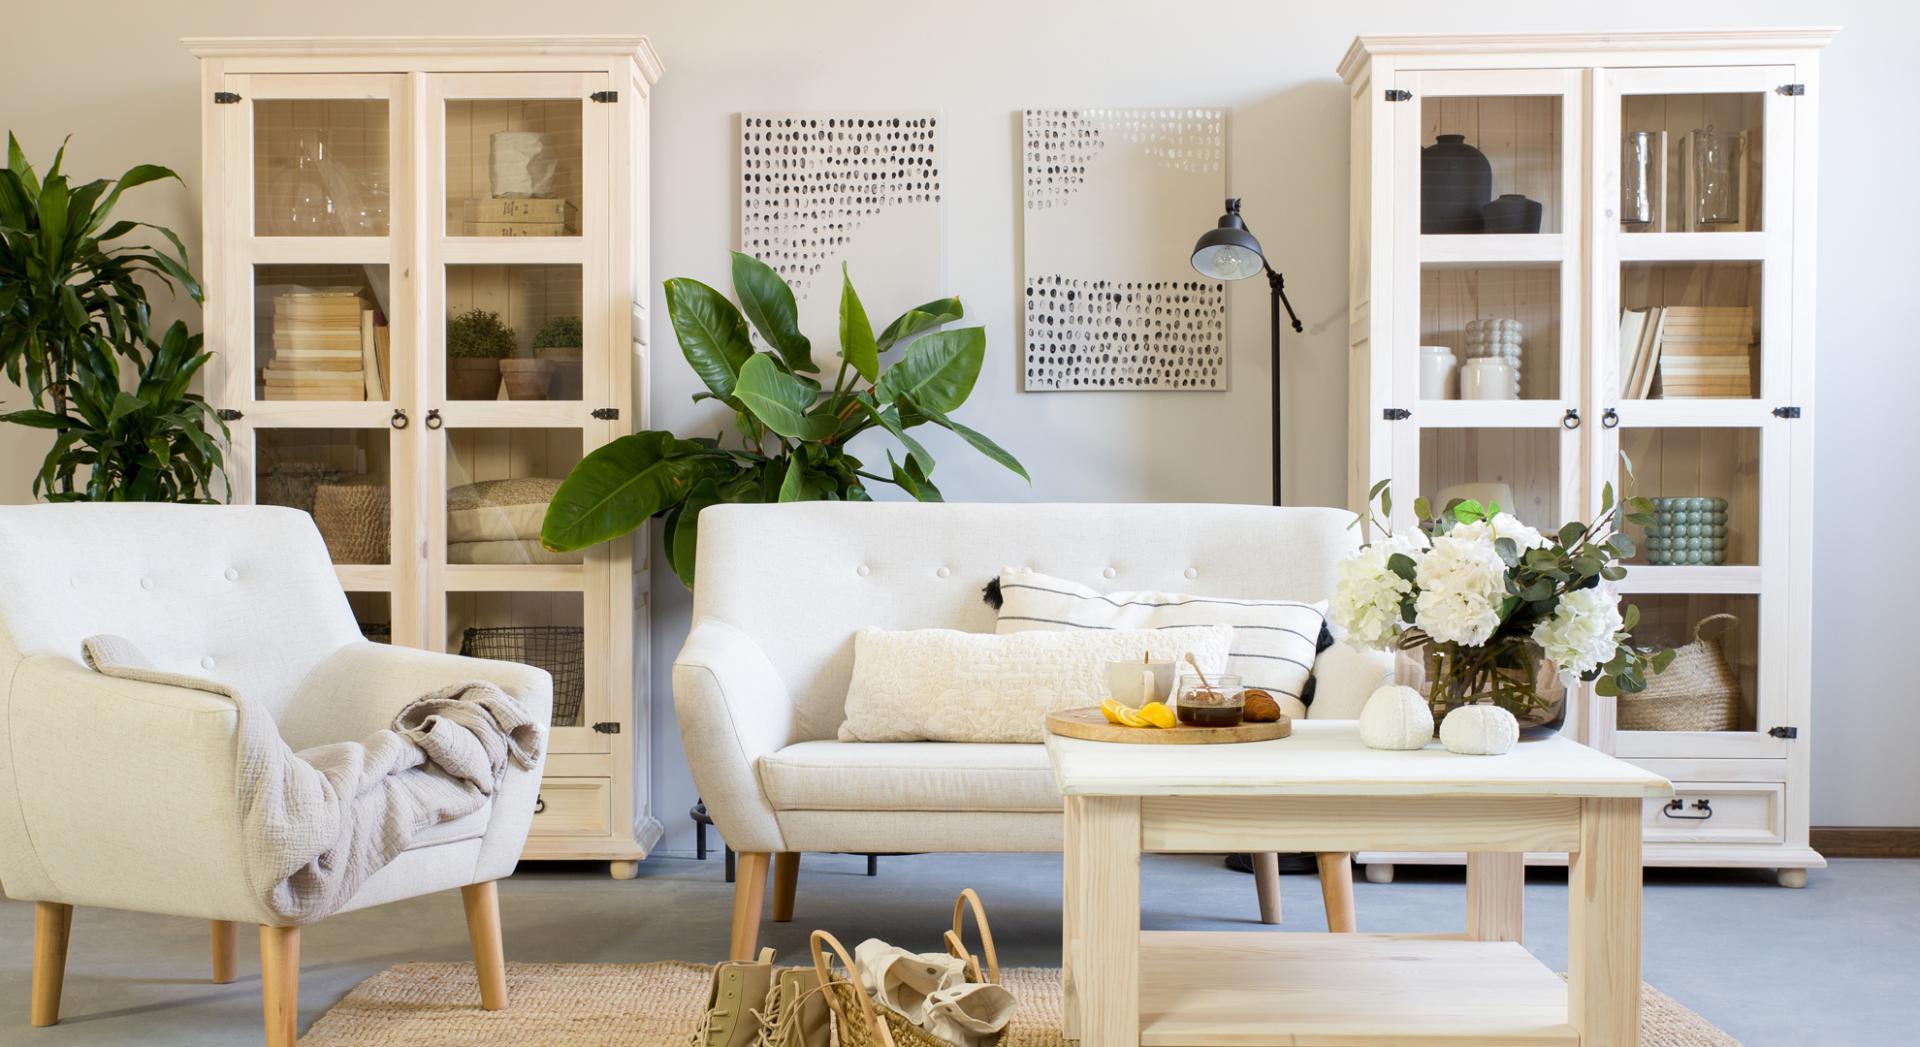 drewniane meble bielone do salonu